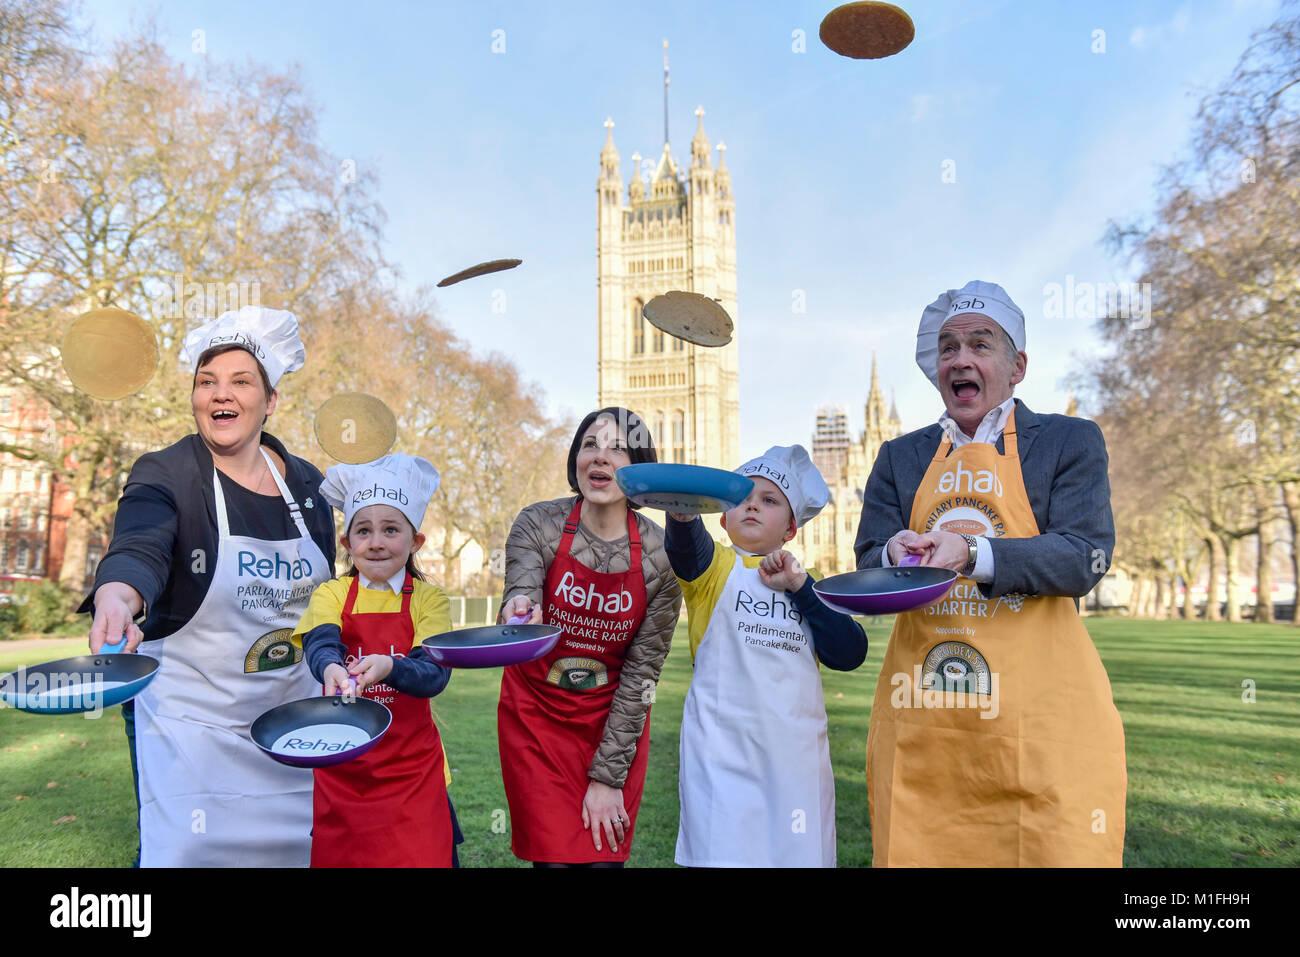 London, UK. 30th Jan, 2018. (L to R) Tonia Antoniazzi MP for the Parliament Team, and ITV News' Lucrezia Millarini - Stock Image